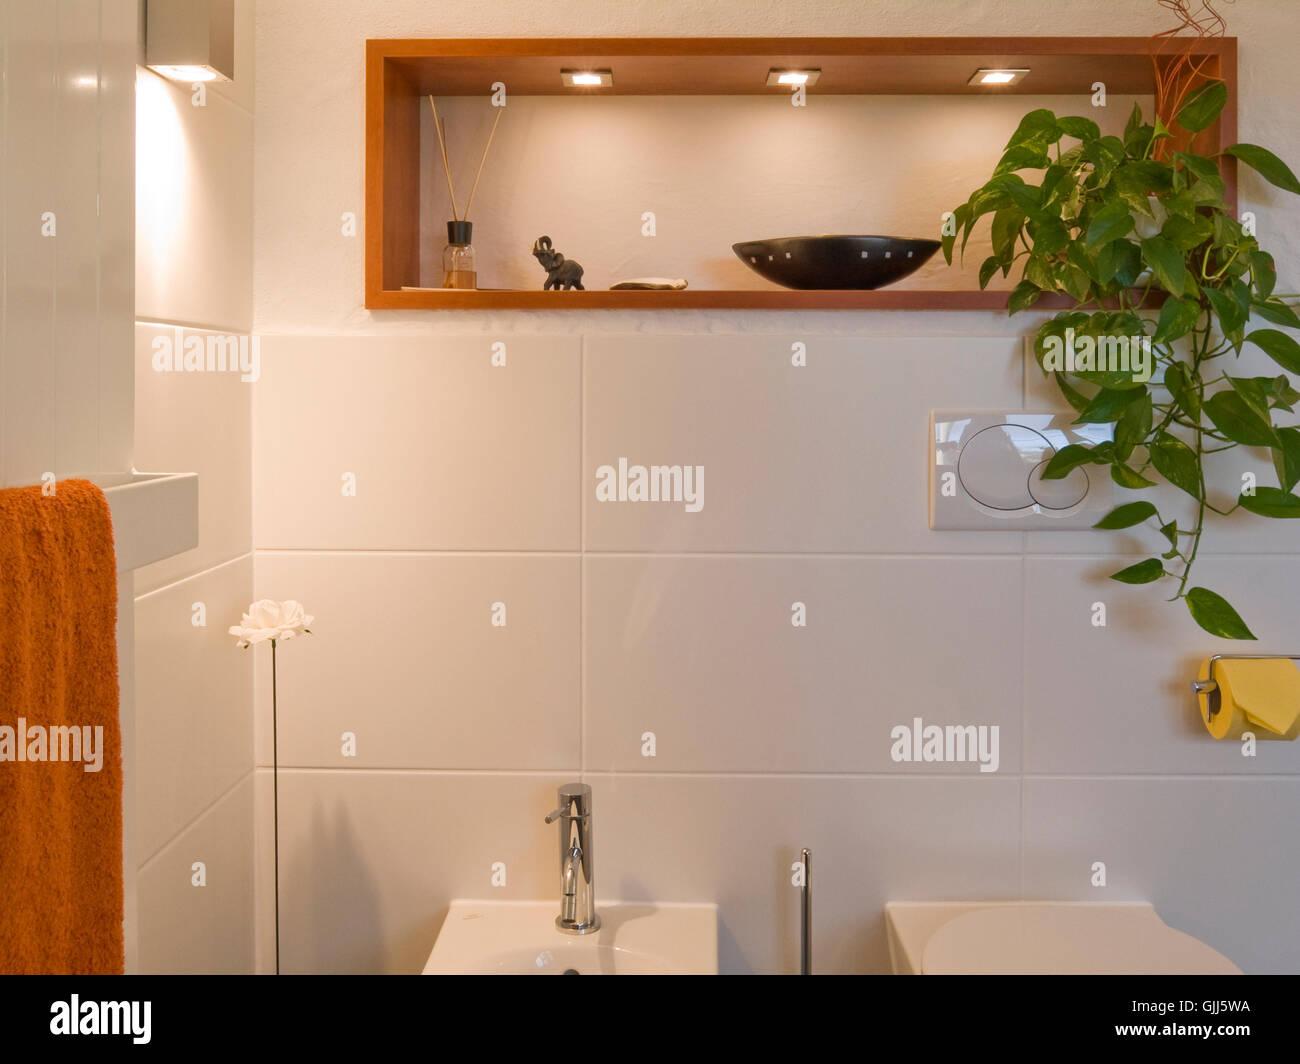 Bad Modern Toilet Bidet Shelf Frontal